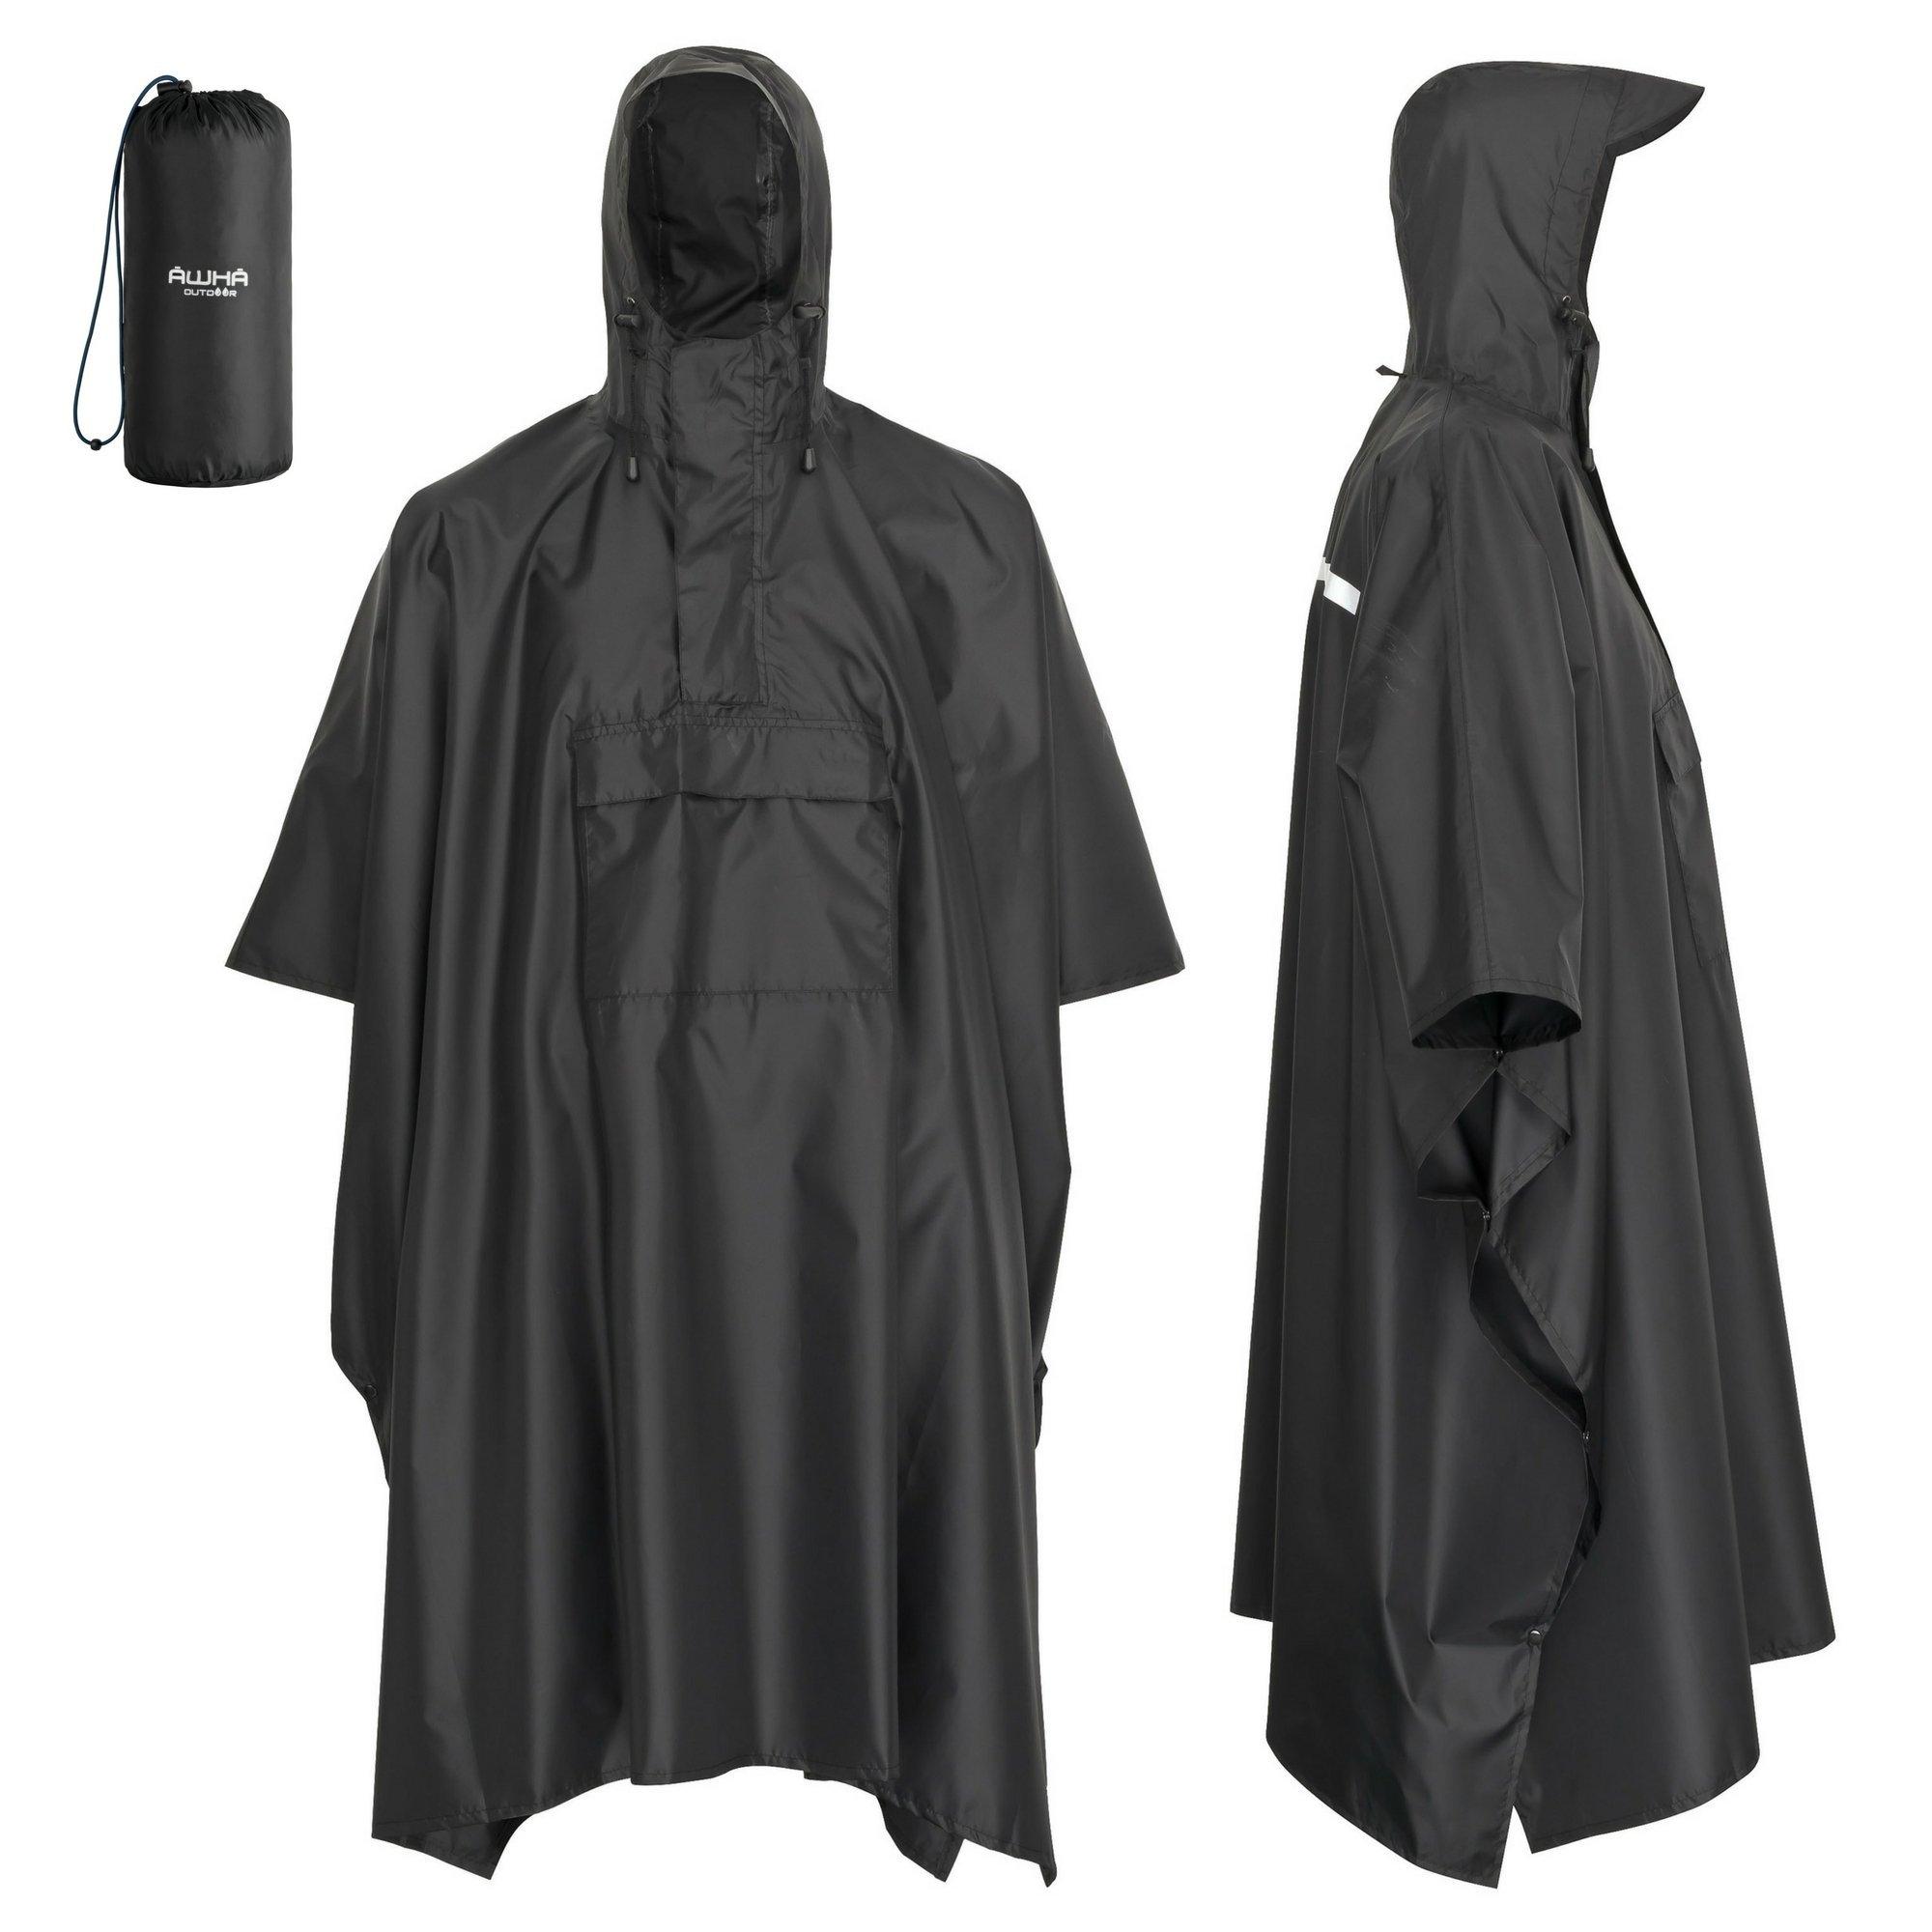 Freundschaftlich Regen Jacke Hose Anzug Regenschutz Regenanzug Regenjacke Regenhose Kapuze Angelsport Regenbekleidung